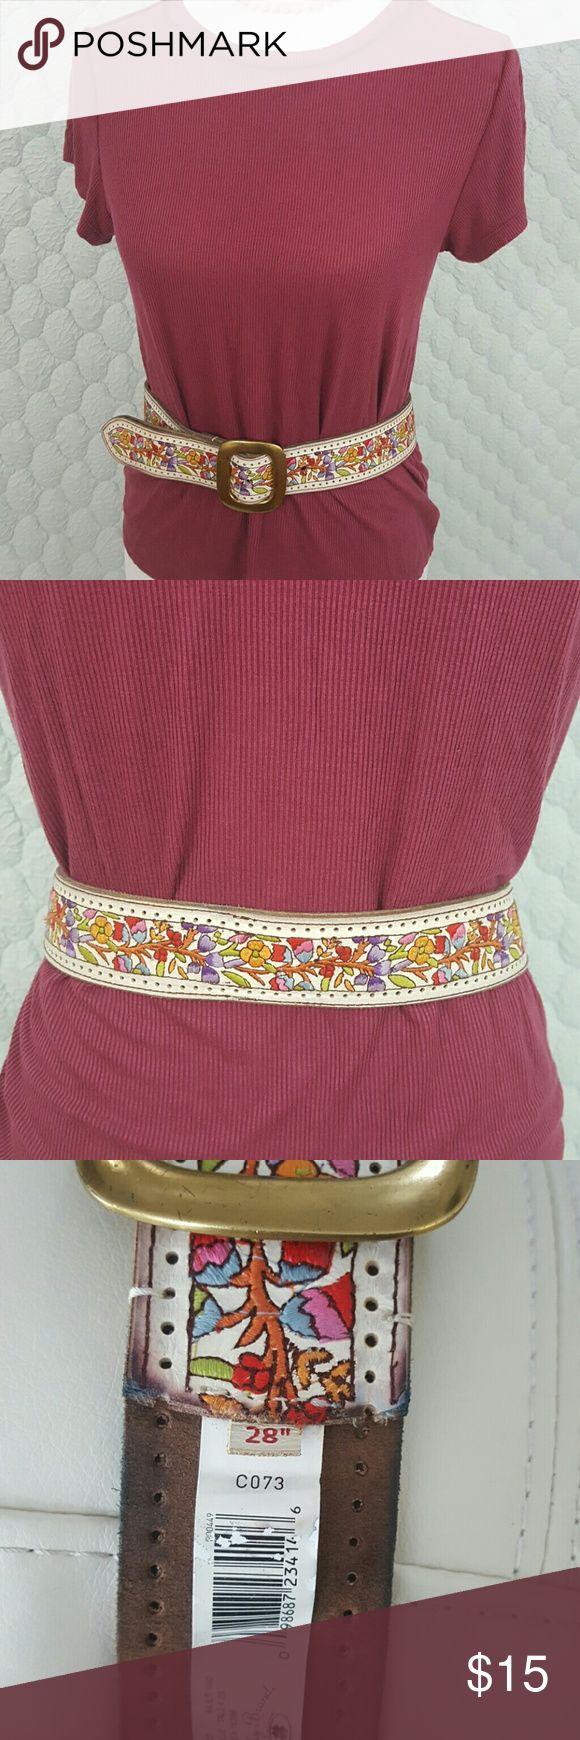 Lucky Brand belt Lycky Brand belt size 28. Super cute, price reflects use. Lucky Brand Accessories Belts